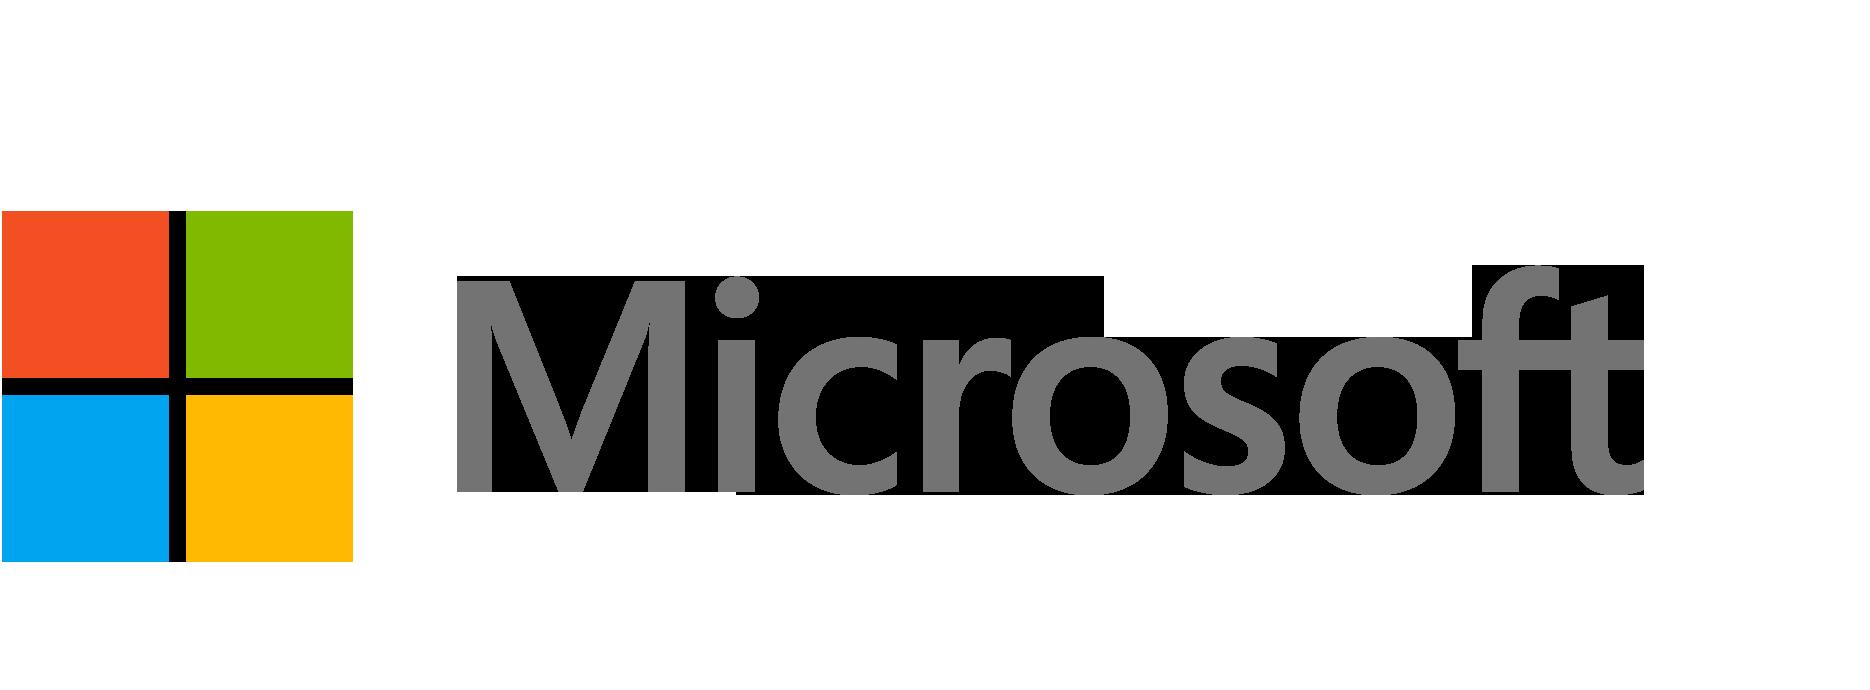 SQL Server Standard - 2 Core License Pack - 3 year (DG7GMGF0FLR2)